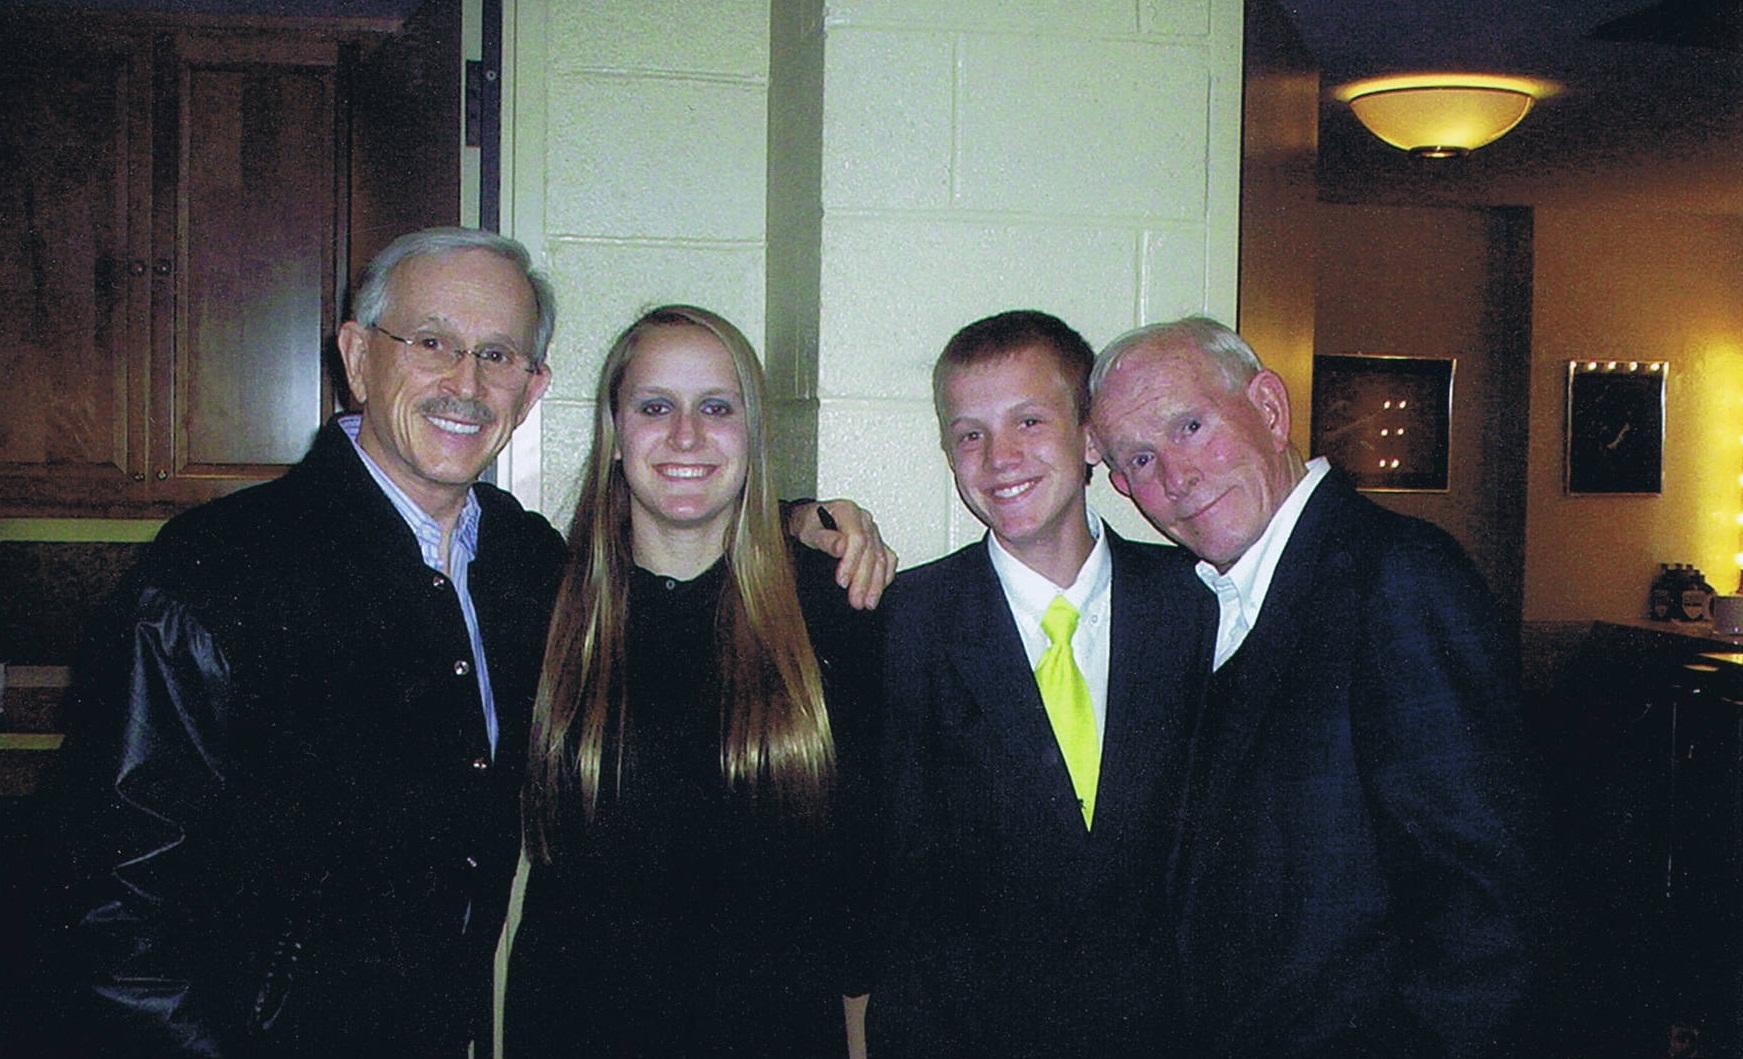 L to R: Dick Smothers, Vika Preddy, Daniel Preddy, Tom Smothers